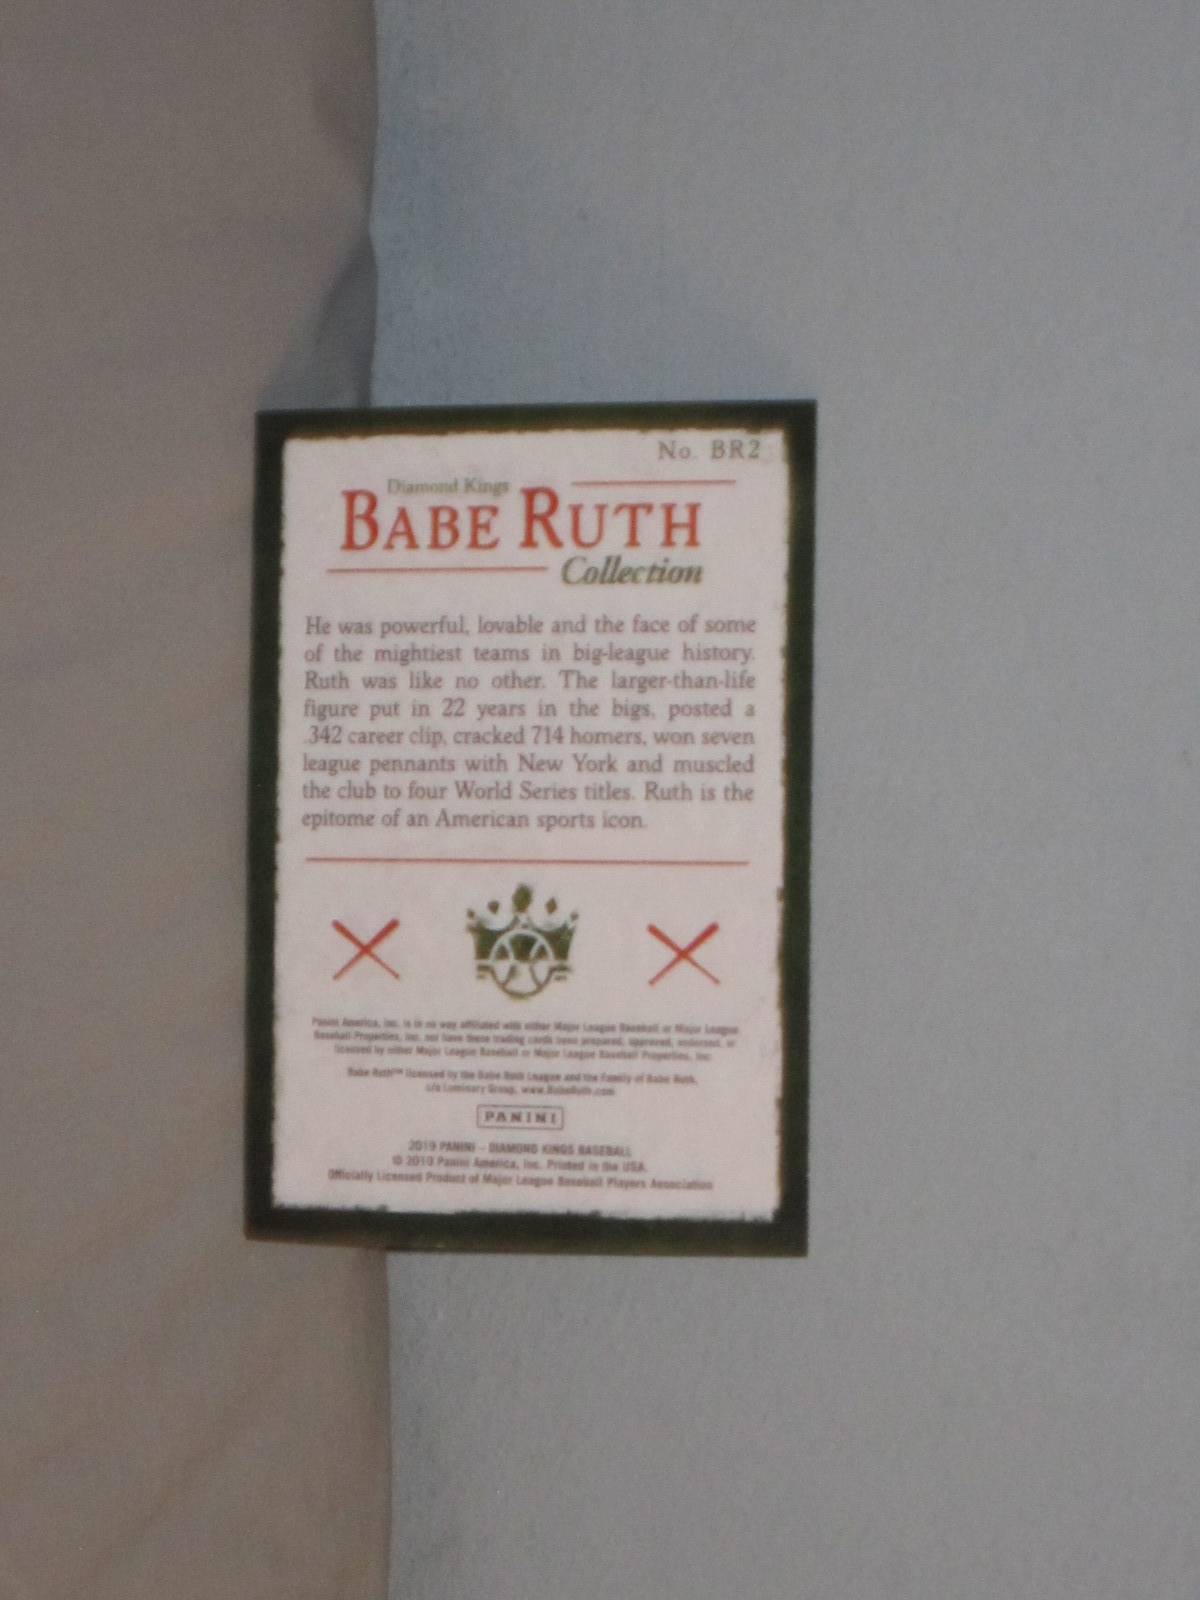 2019 Panini Diamond Kings Babe Ruth Collection NY Yankees